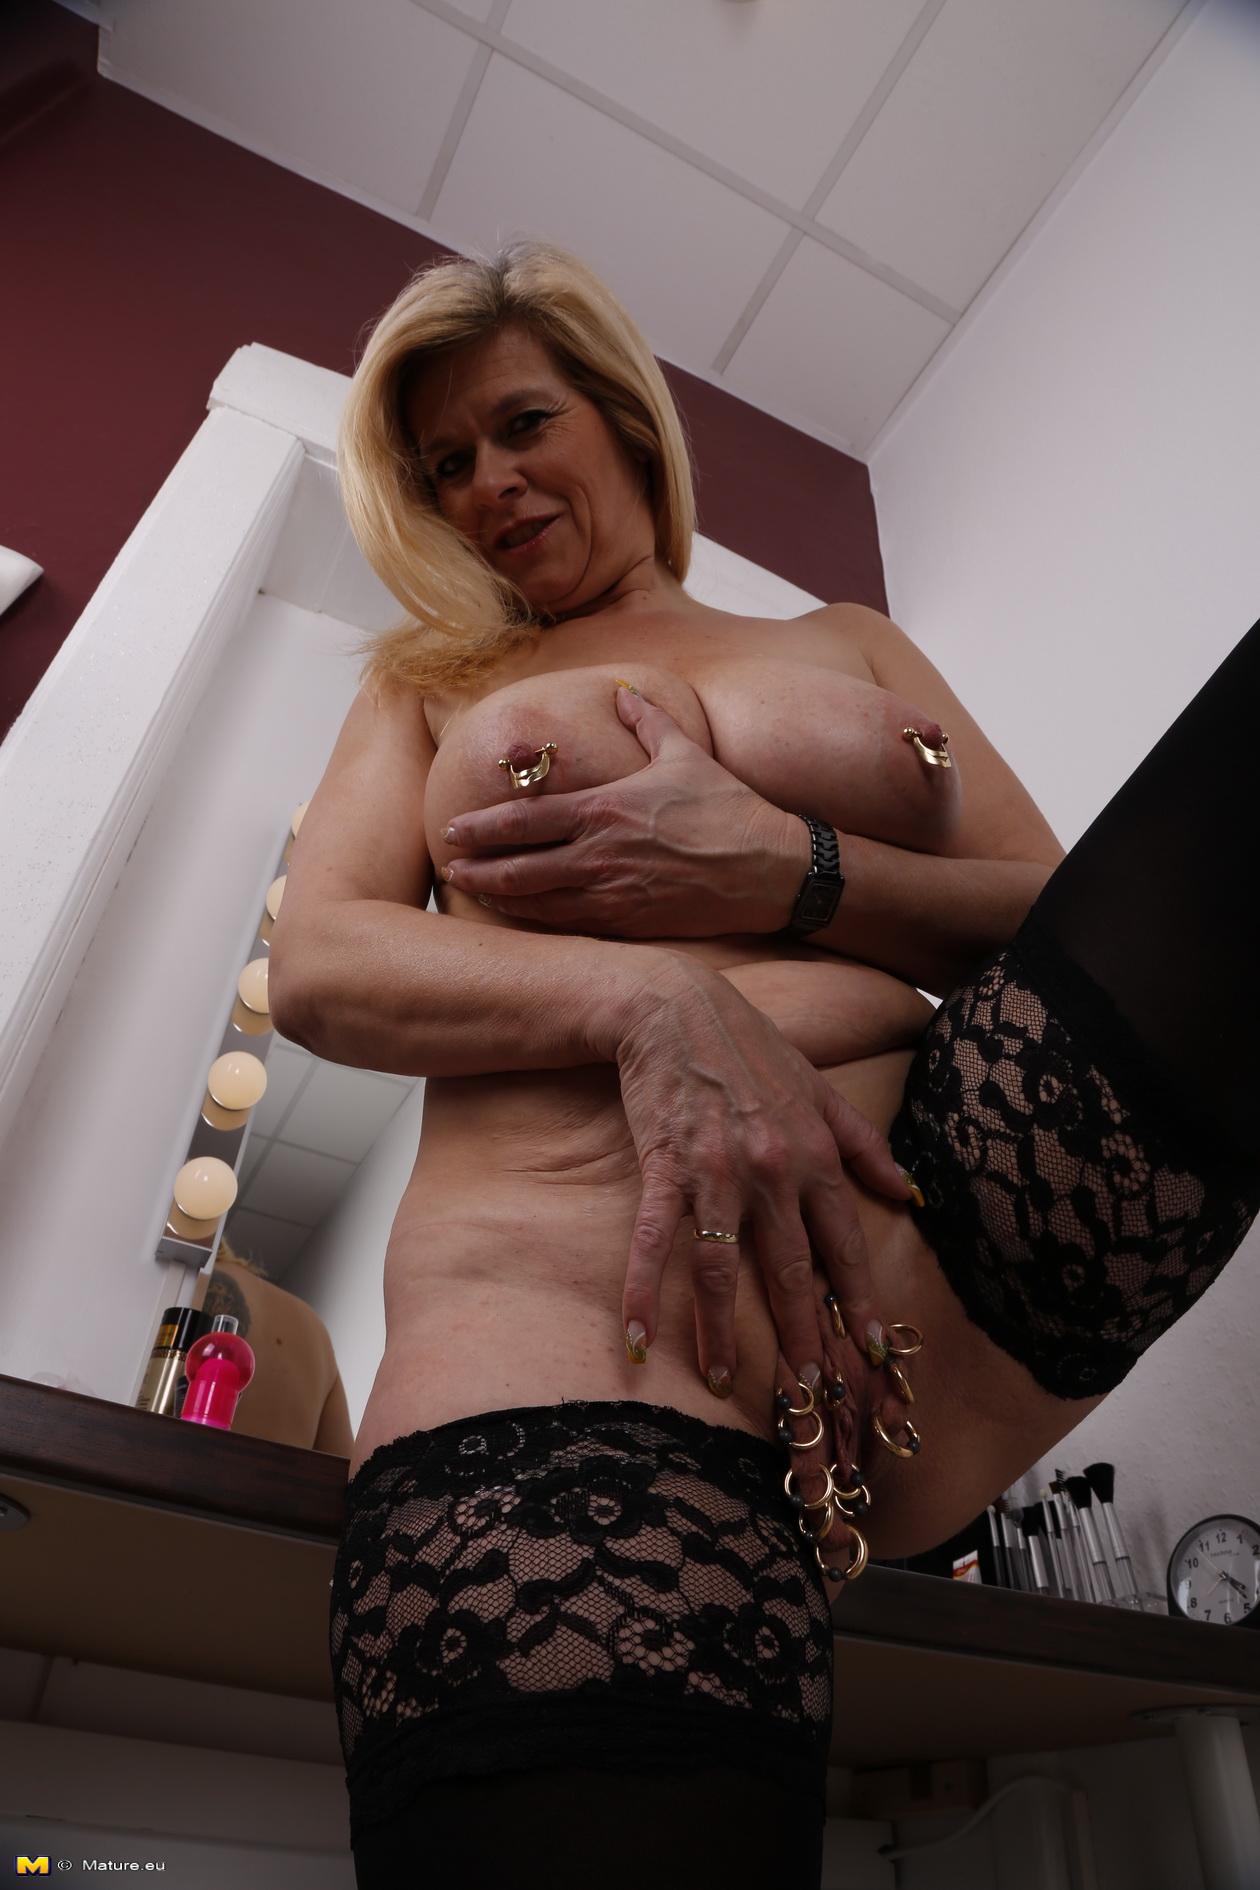 Women mature images horny hot porn